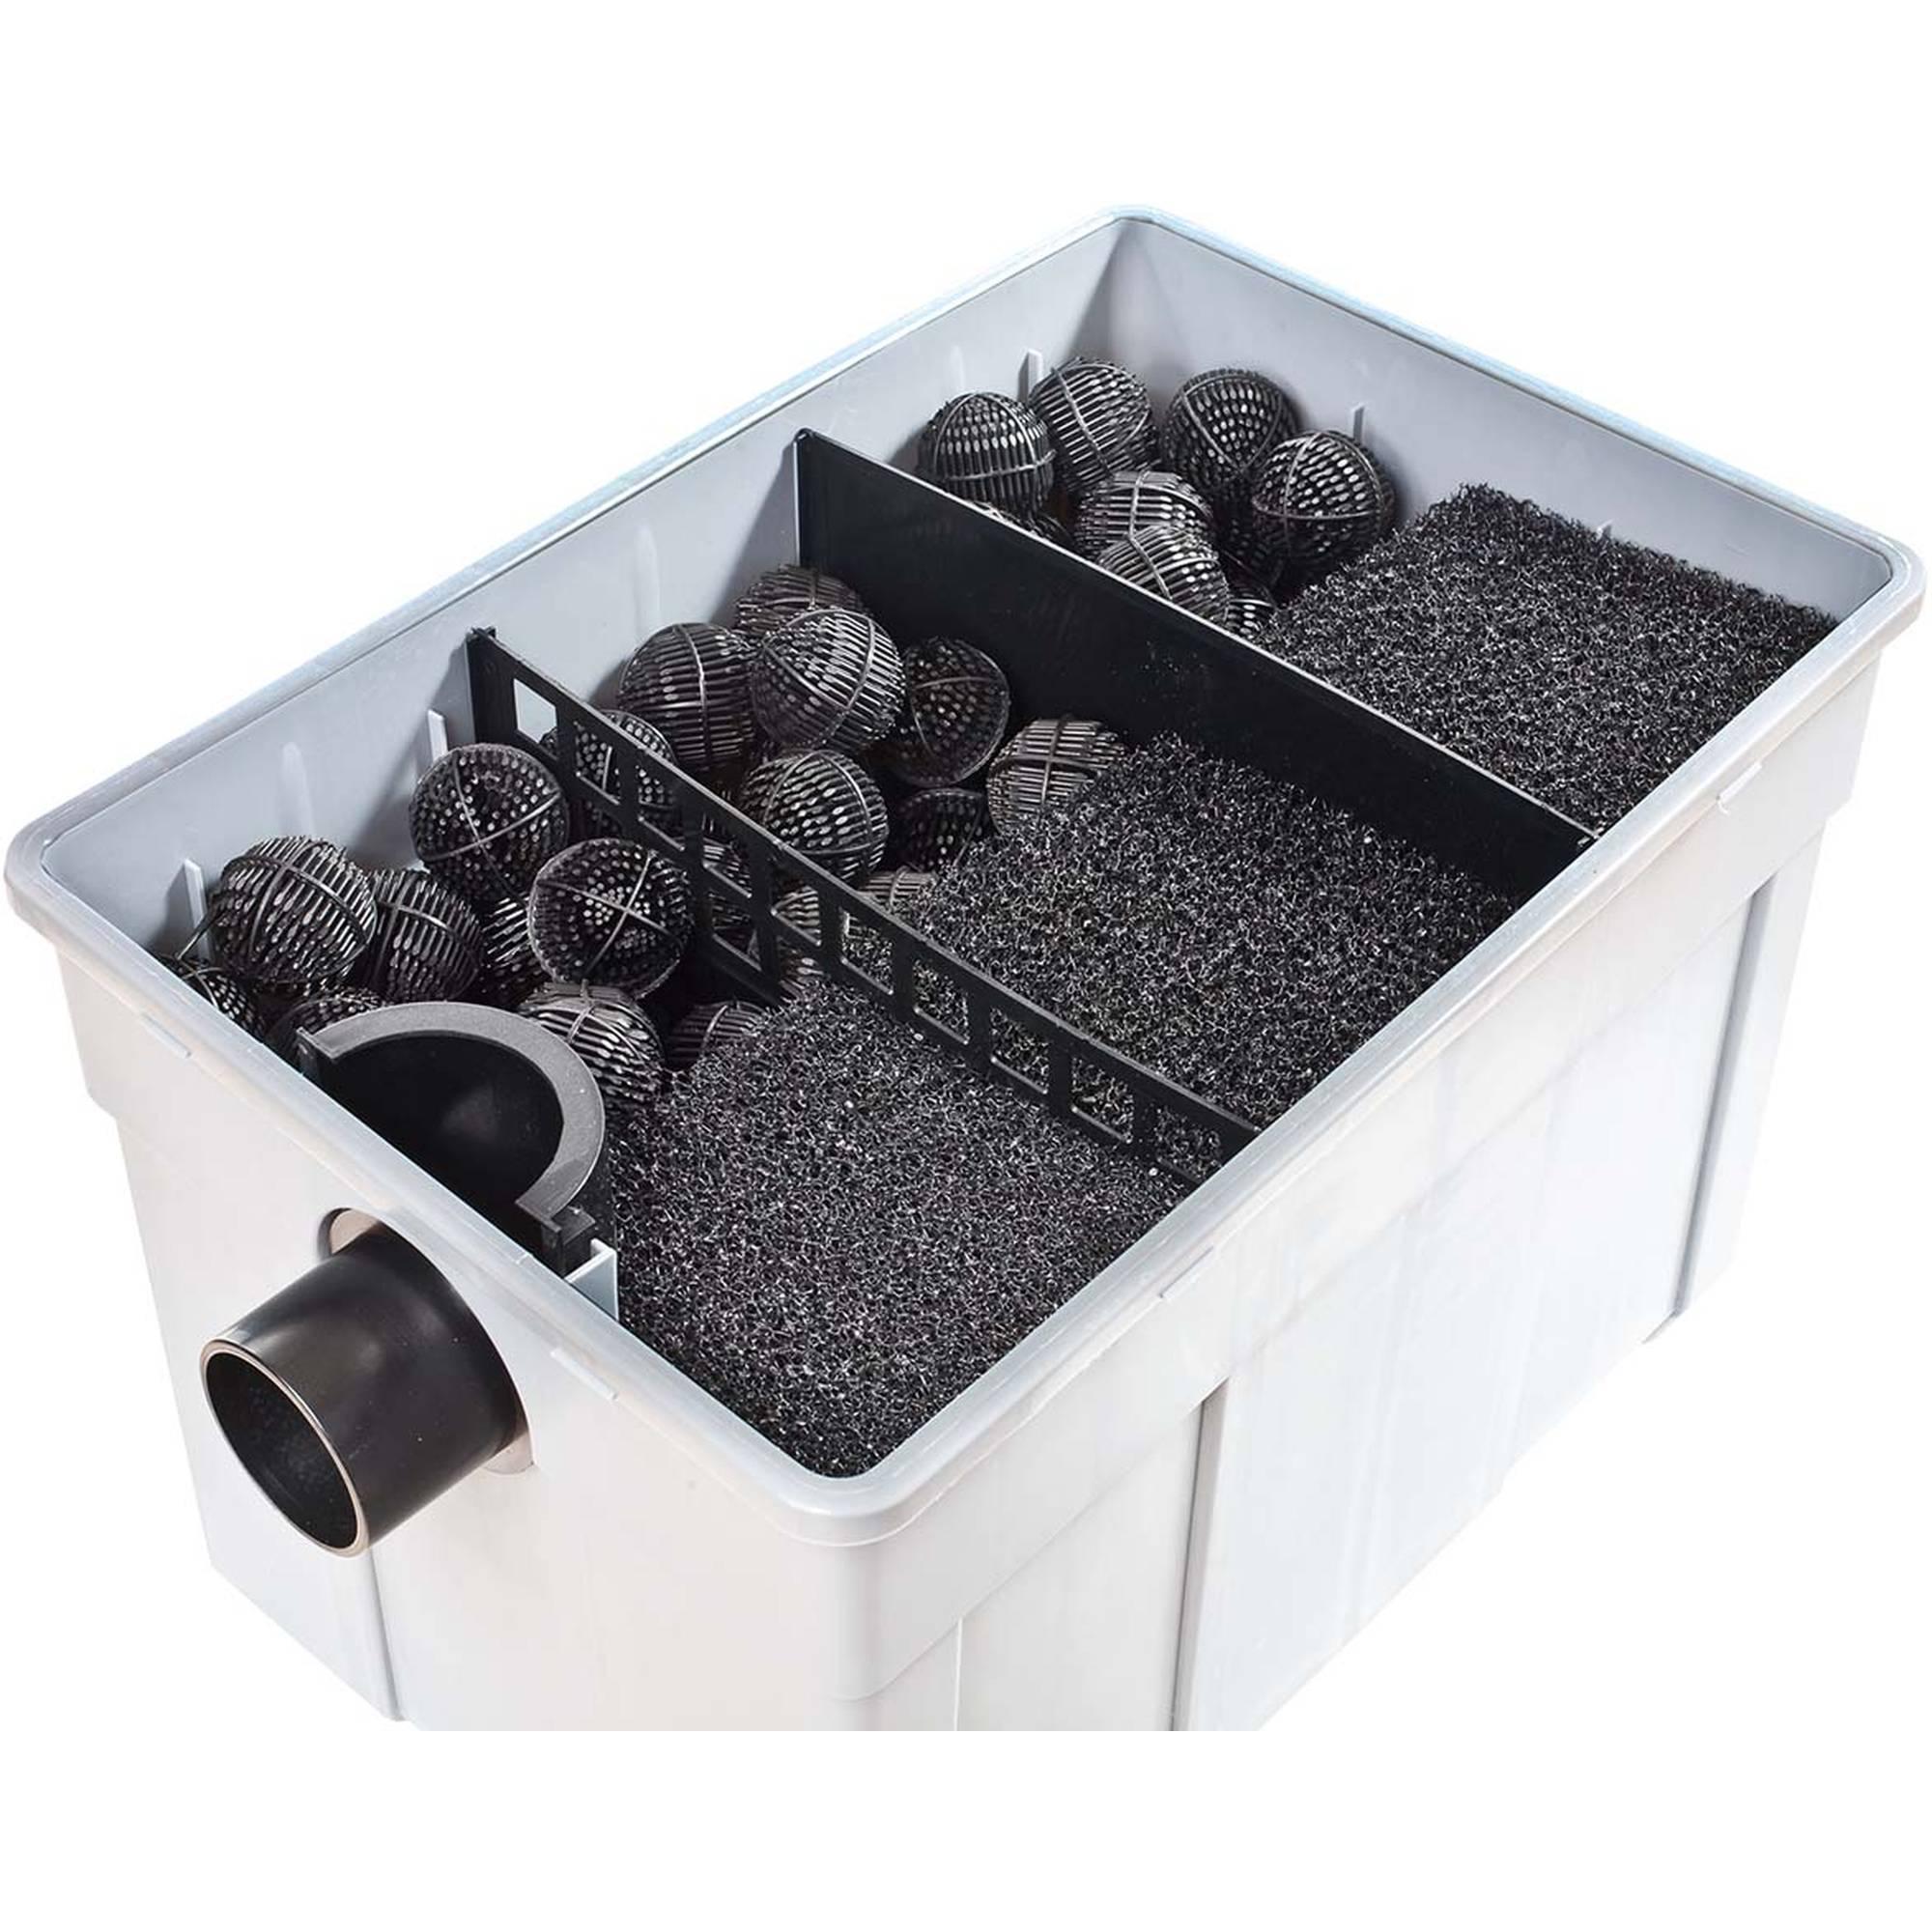 Teichfilter-Komplett-Set mit Pumpe + UVC